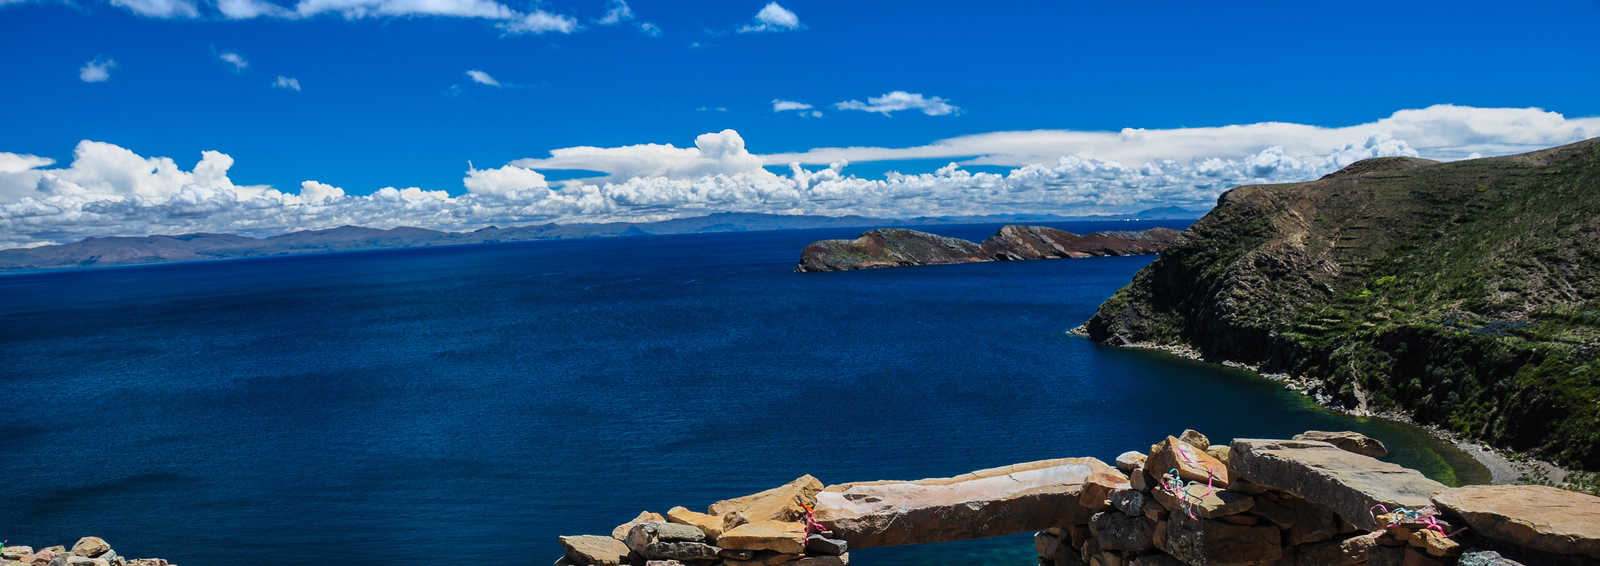 Inca Ruins of Isla del Sol, Lake Titicaca, Bolivia